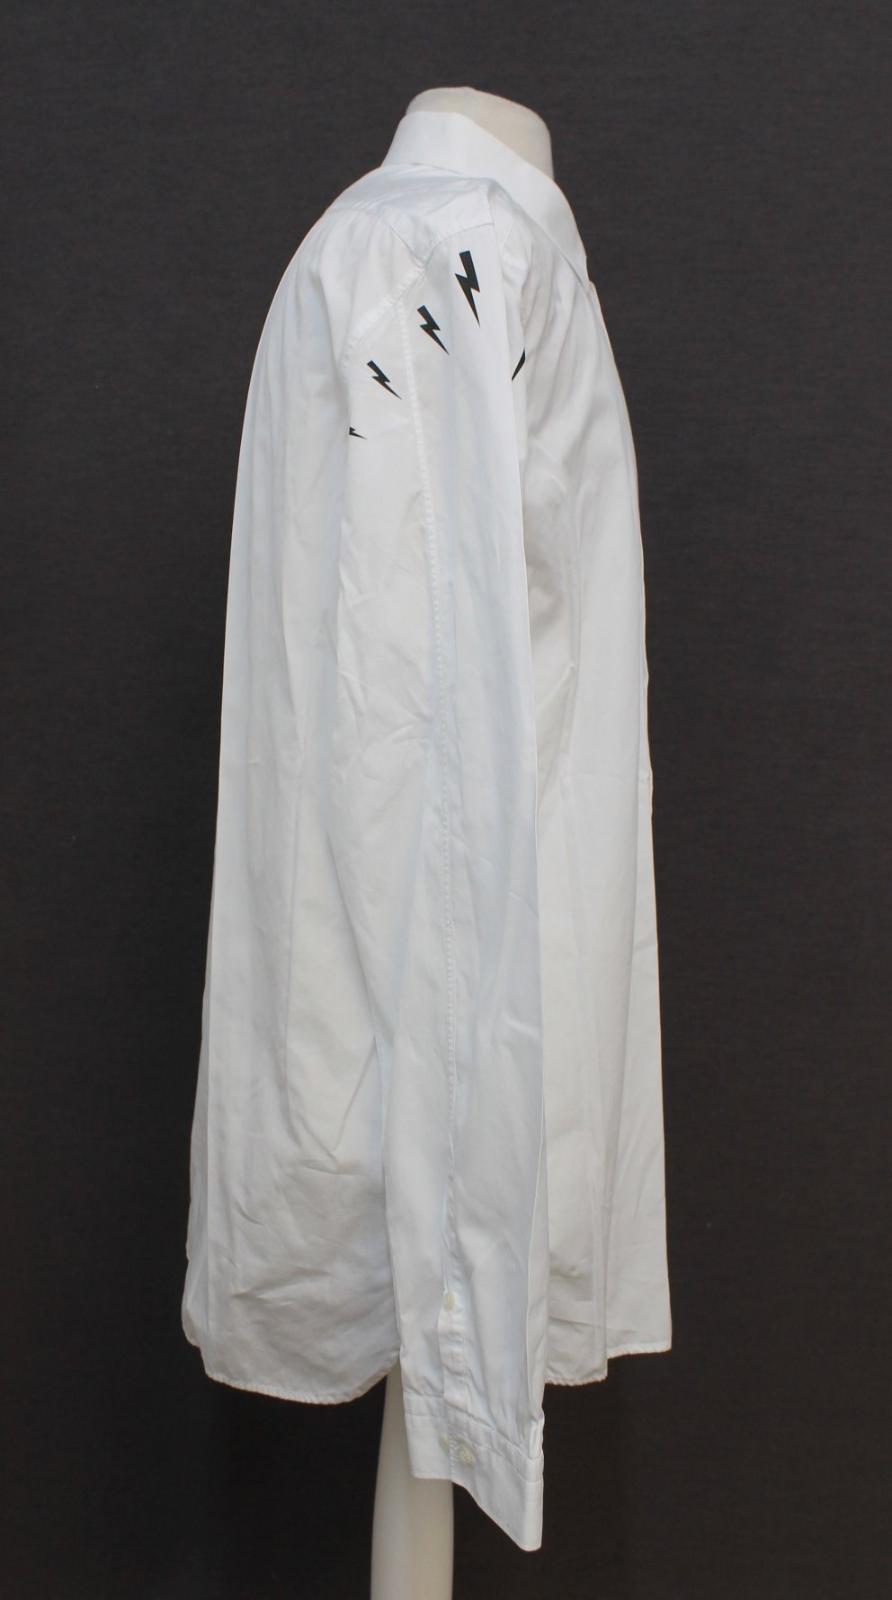 Neil-barrett-hombre-blanco-de-algodon-manga-de-Rayo-con-cuello-camisa-tamano-17-5-034 miniatura 4